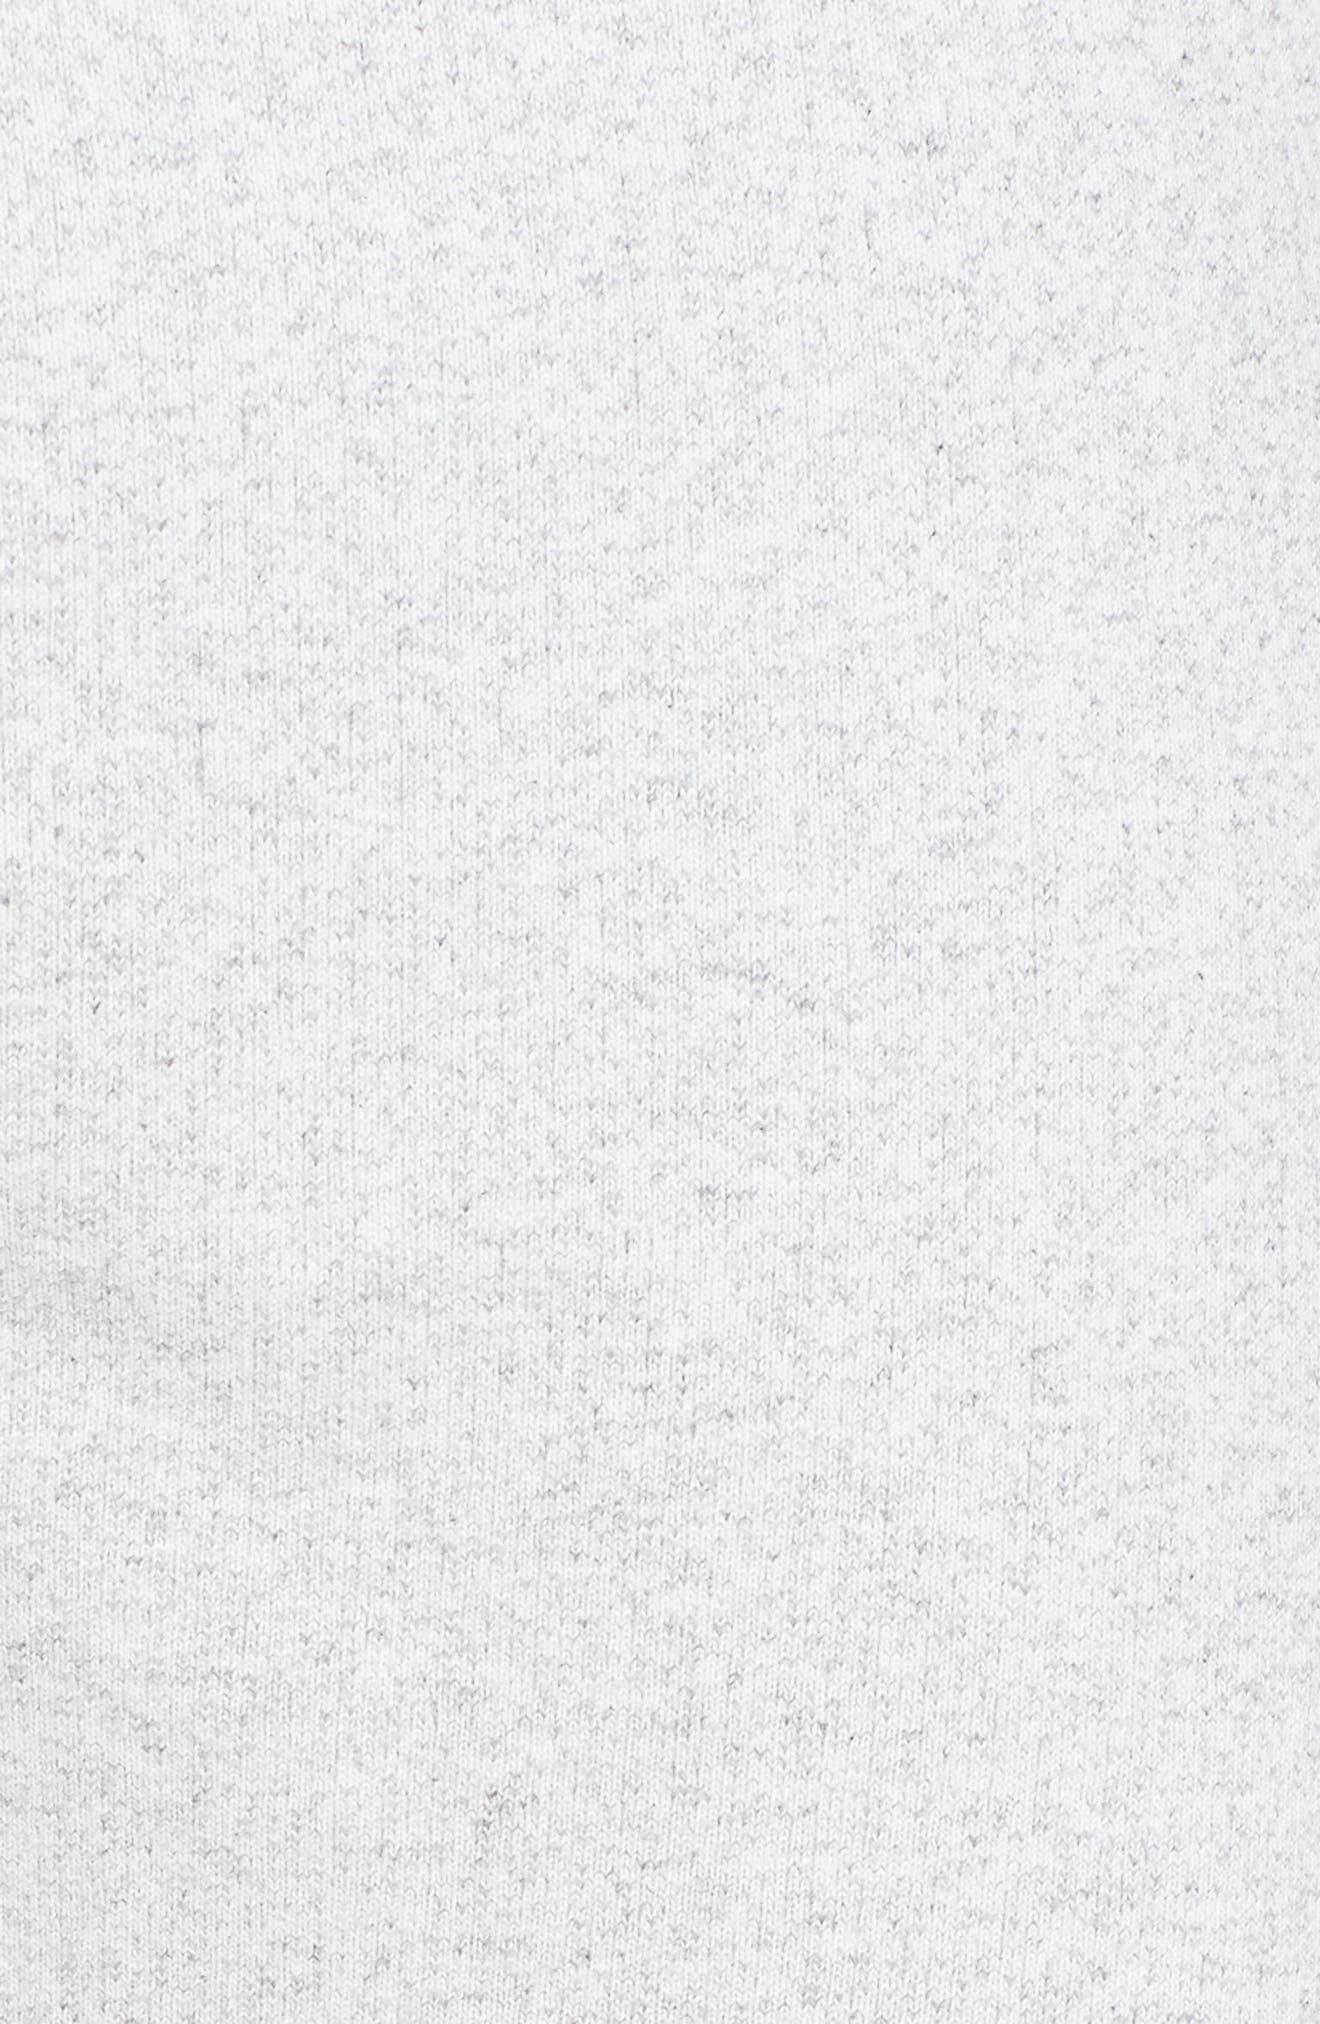 Slim Fit Heavyweight Sweatpants,                             Alternate thumbnail 5, color,                             Chalk